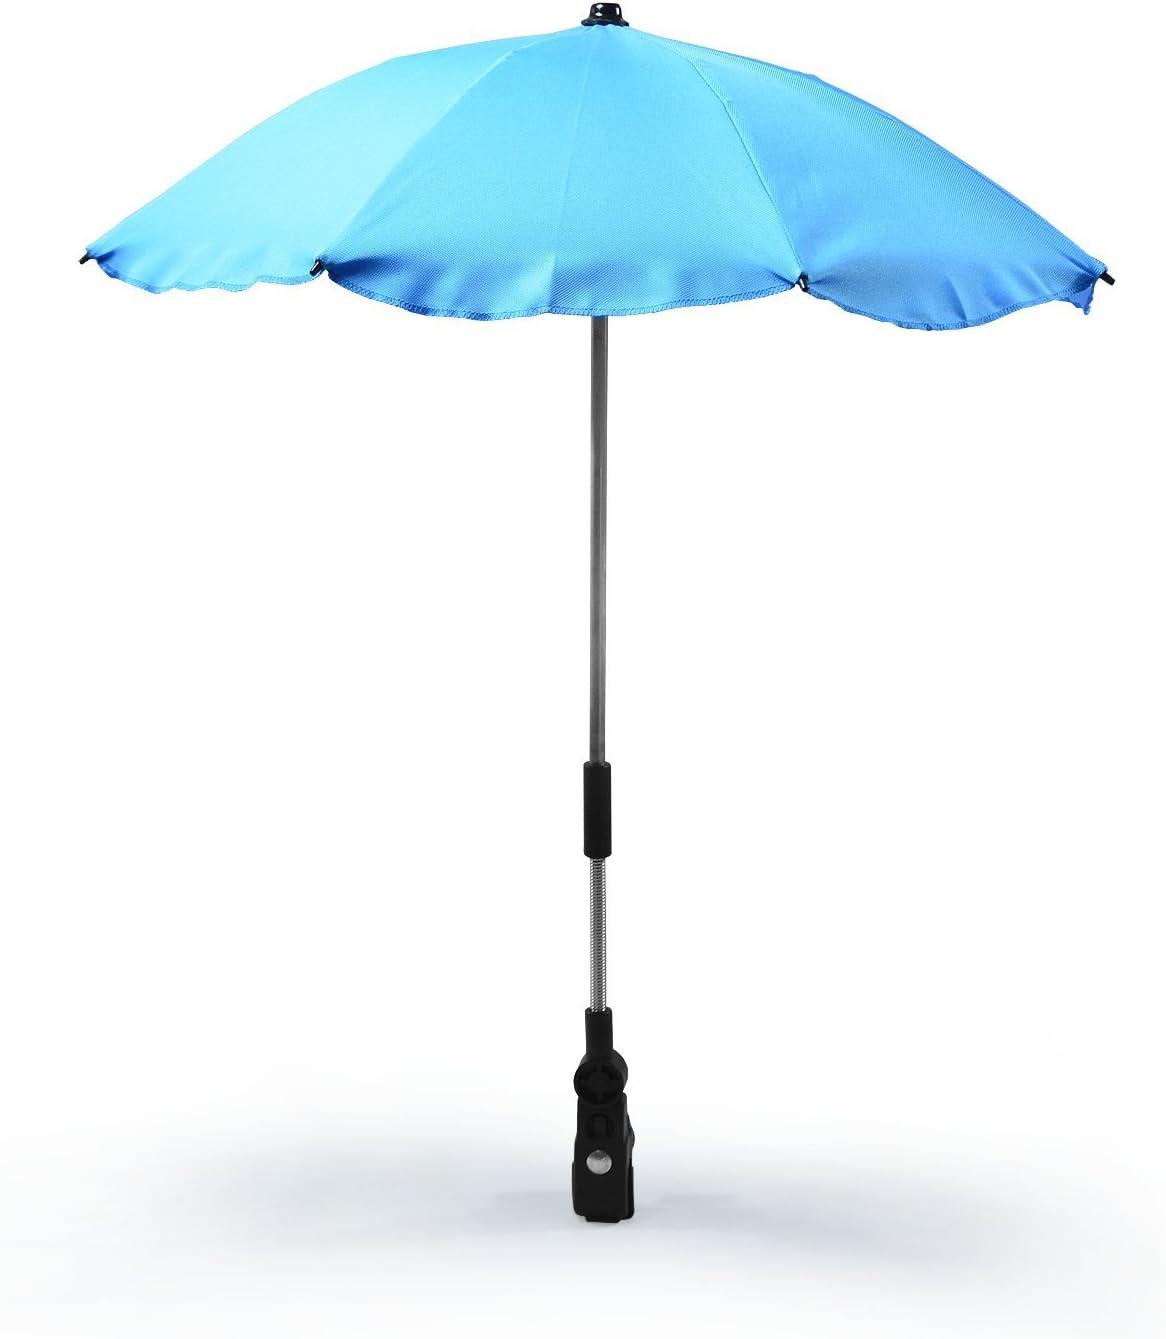 dos colores gris y azul Universal sombrilla paraguas para carrito y Sport Buggy pantalla para cochecito de beb/é con soporte universal UV schutz50/+ toldo Protecci/ón Solar